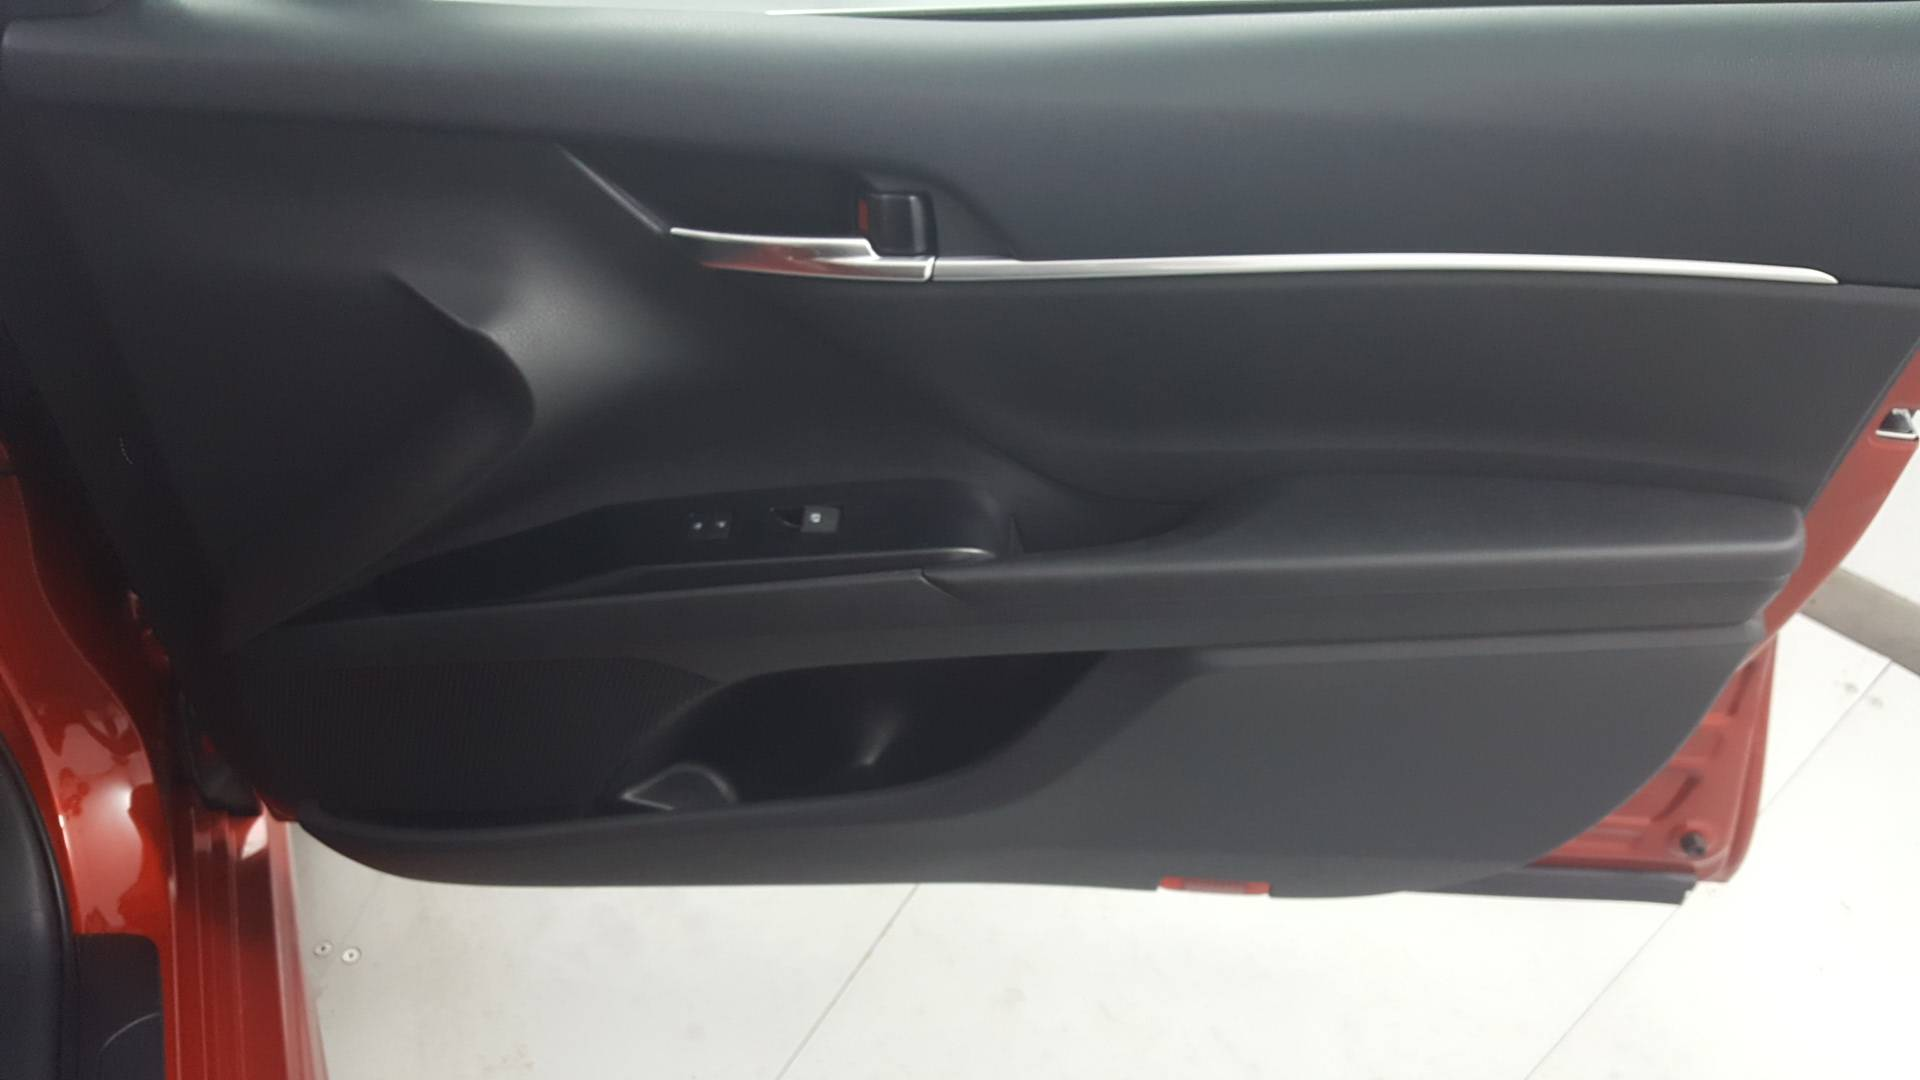 2020 Toyota Camry Hybrid 4dr Car